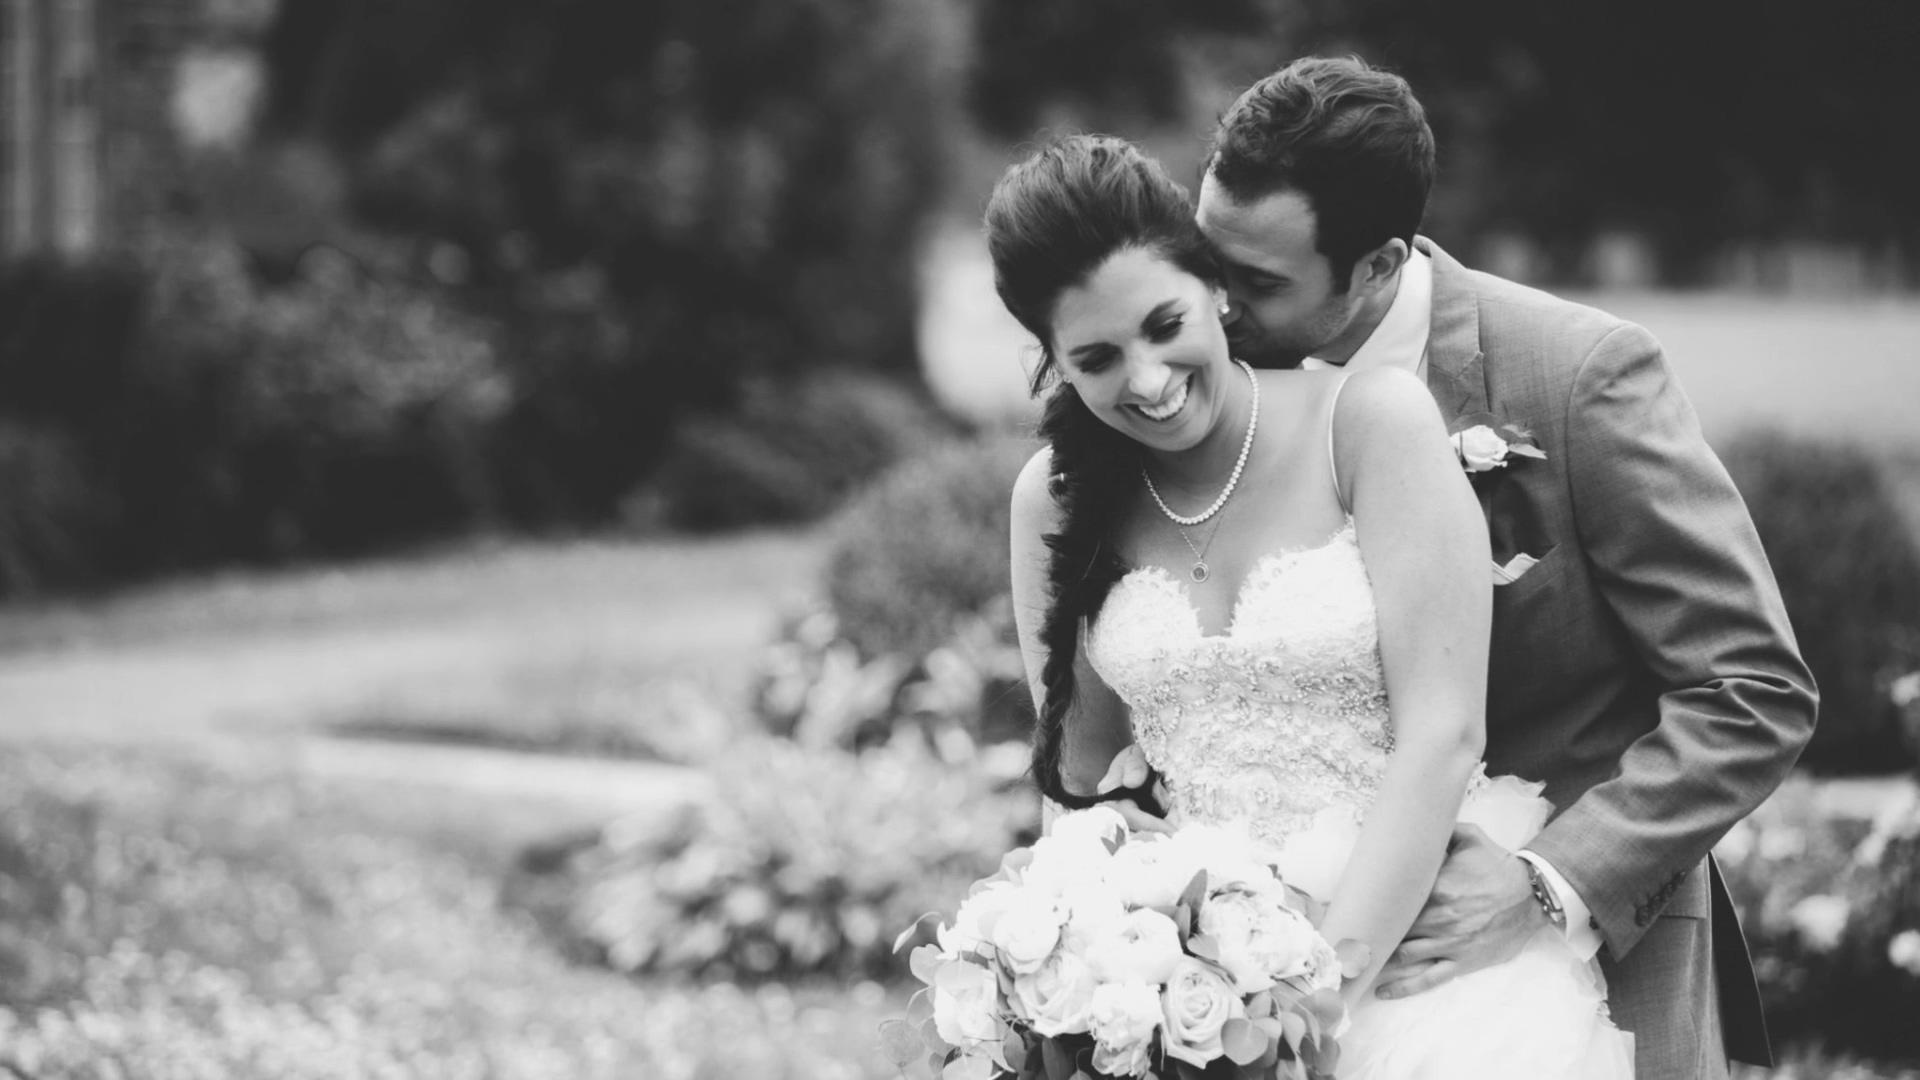 2020_Wedding_Photos_at_Eisenhower_Park_1080p